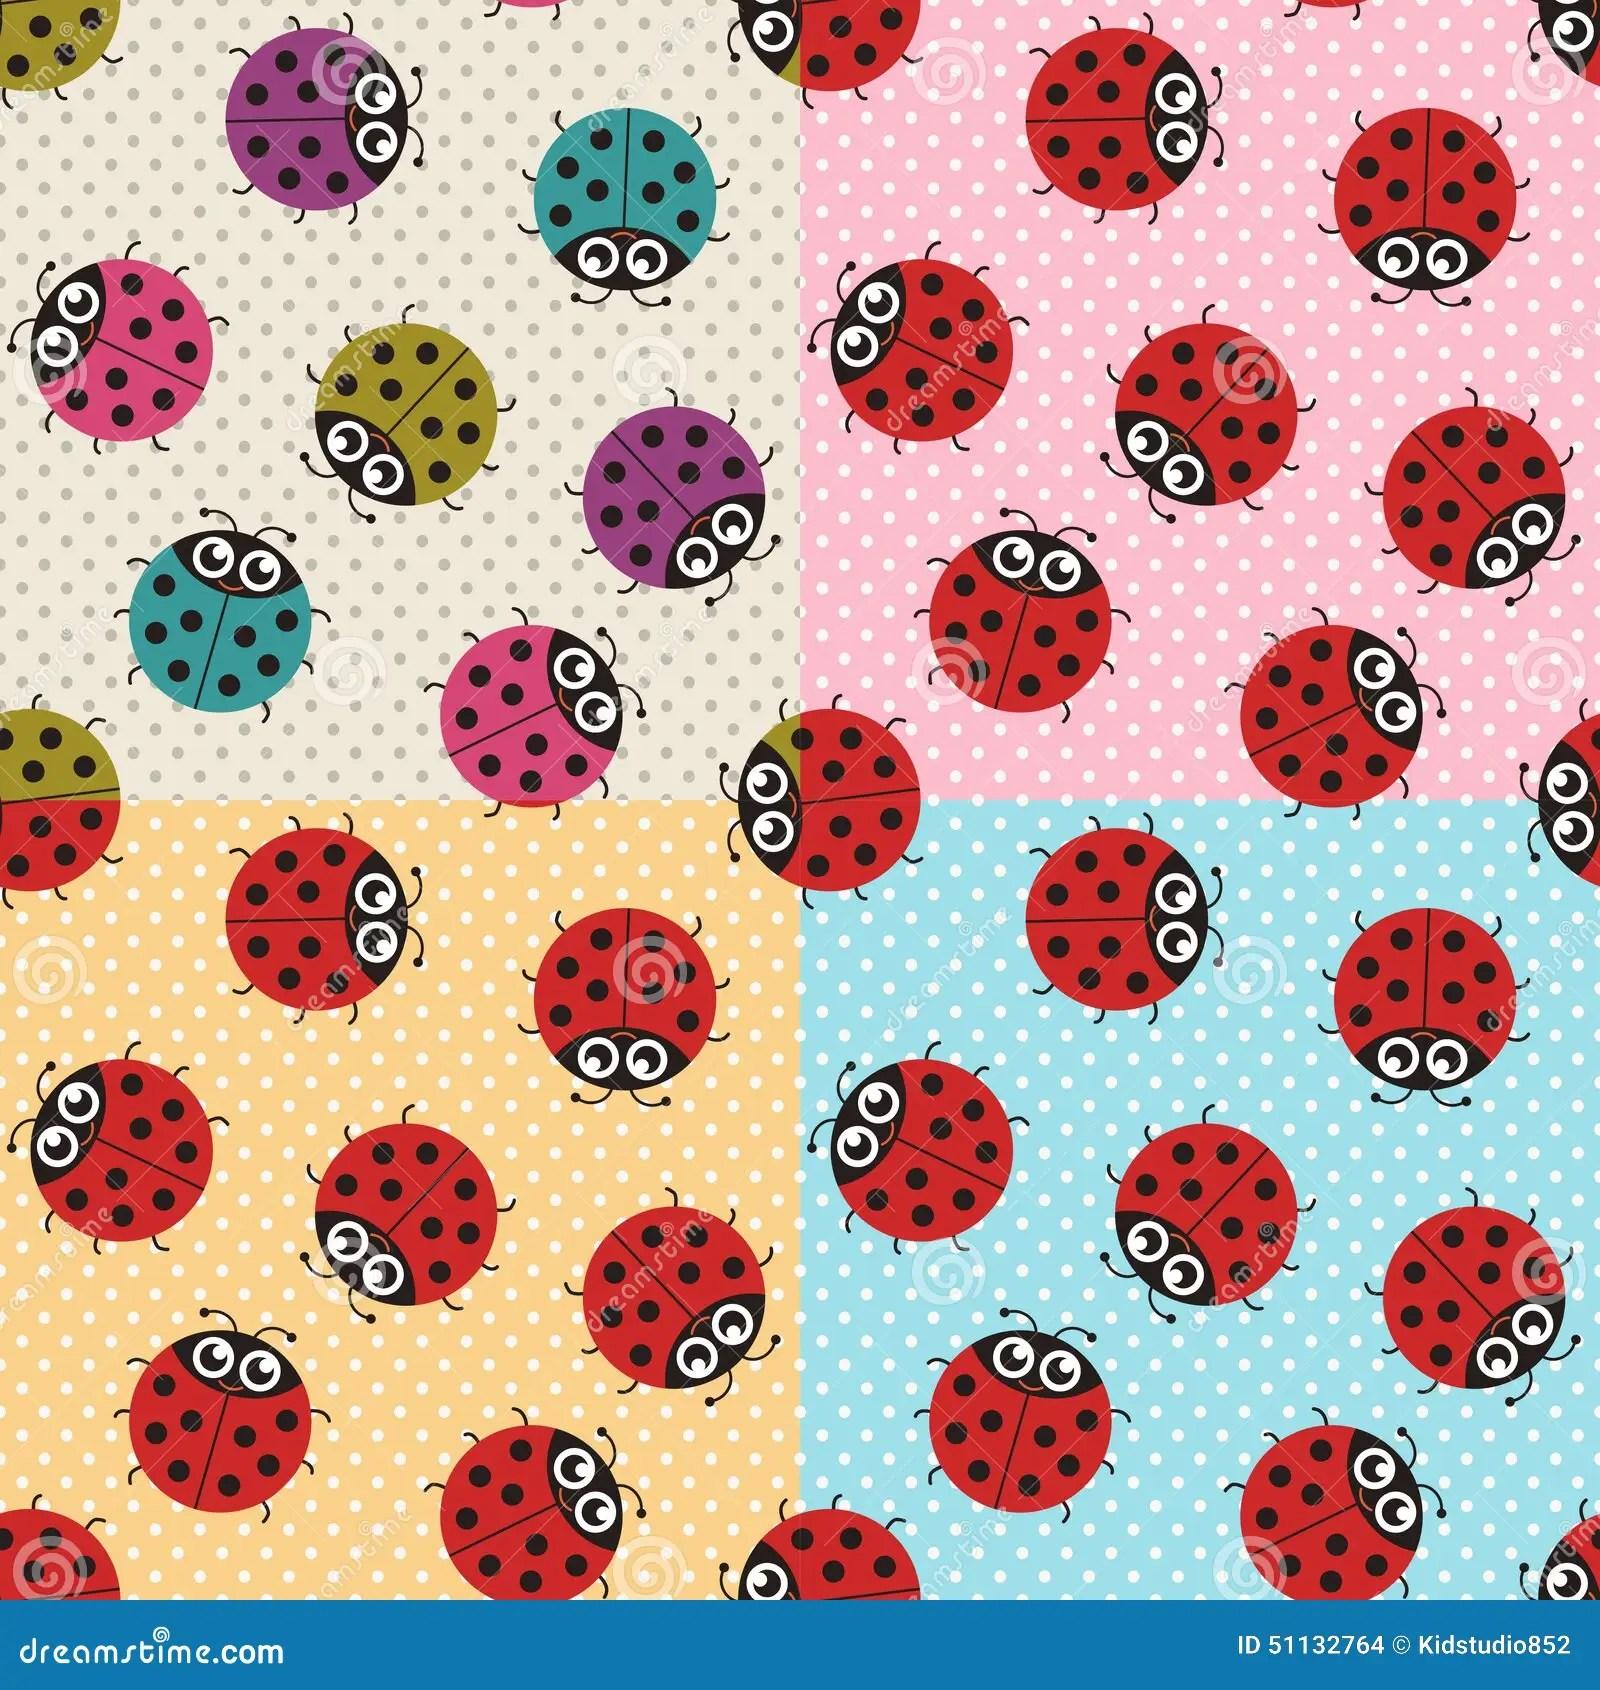 Pink Animal Print Wallpaper Seamless Ladybug Fabric Pattern Stock Vector Image 51132764